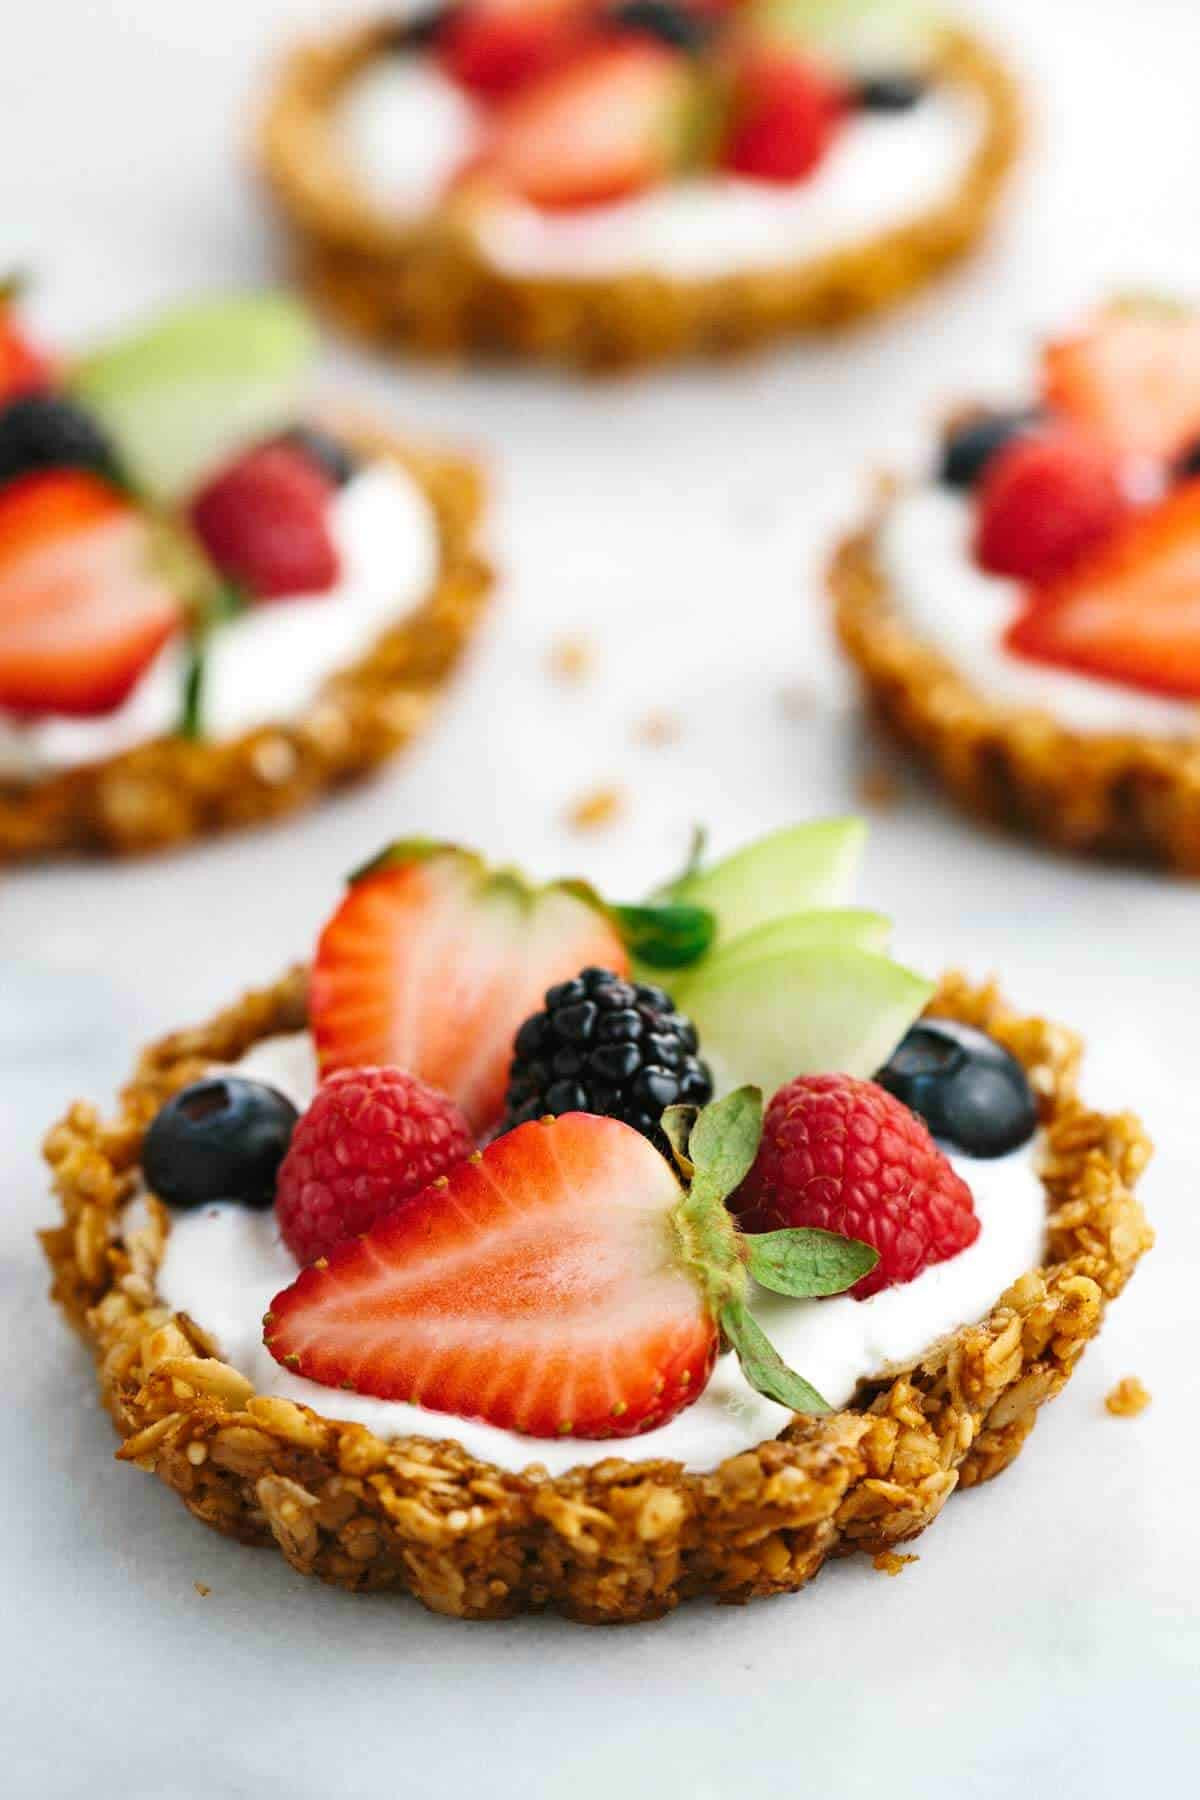 Fruit Pie Recipes  Breakfast Granola Fruit Tart with Yogurt Recipe